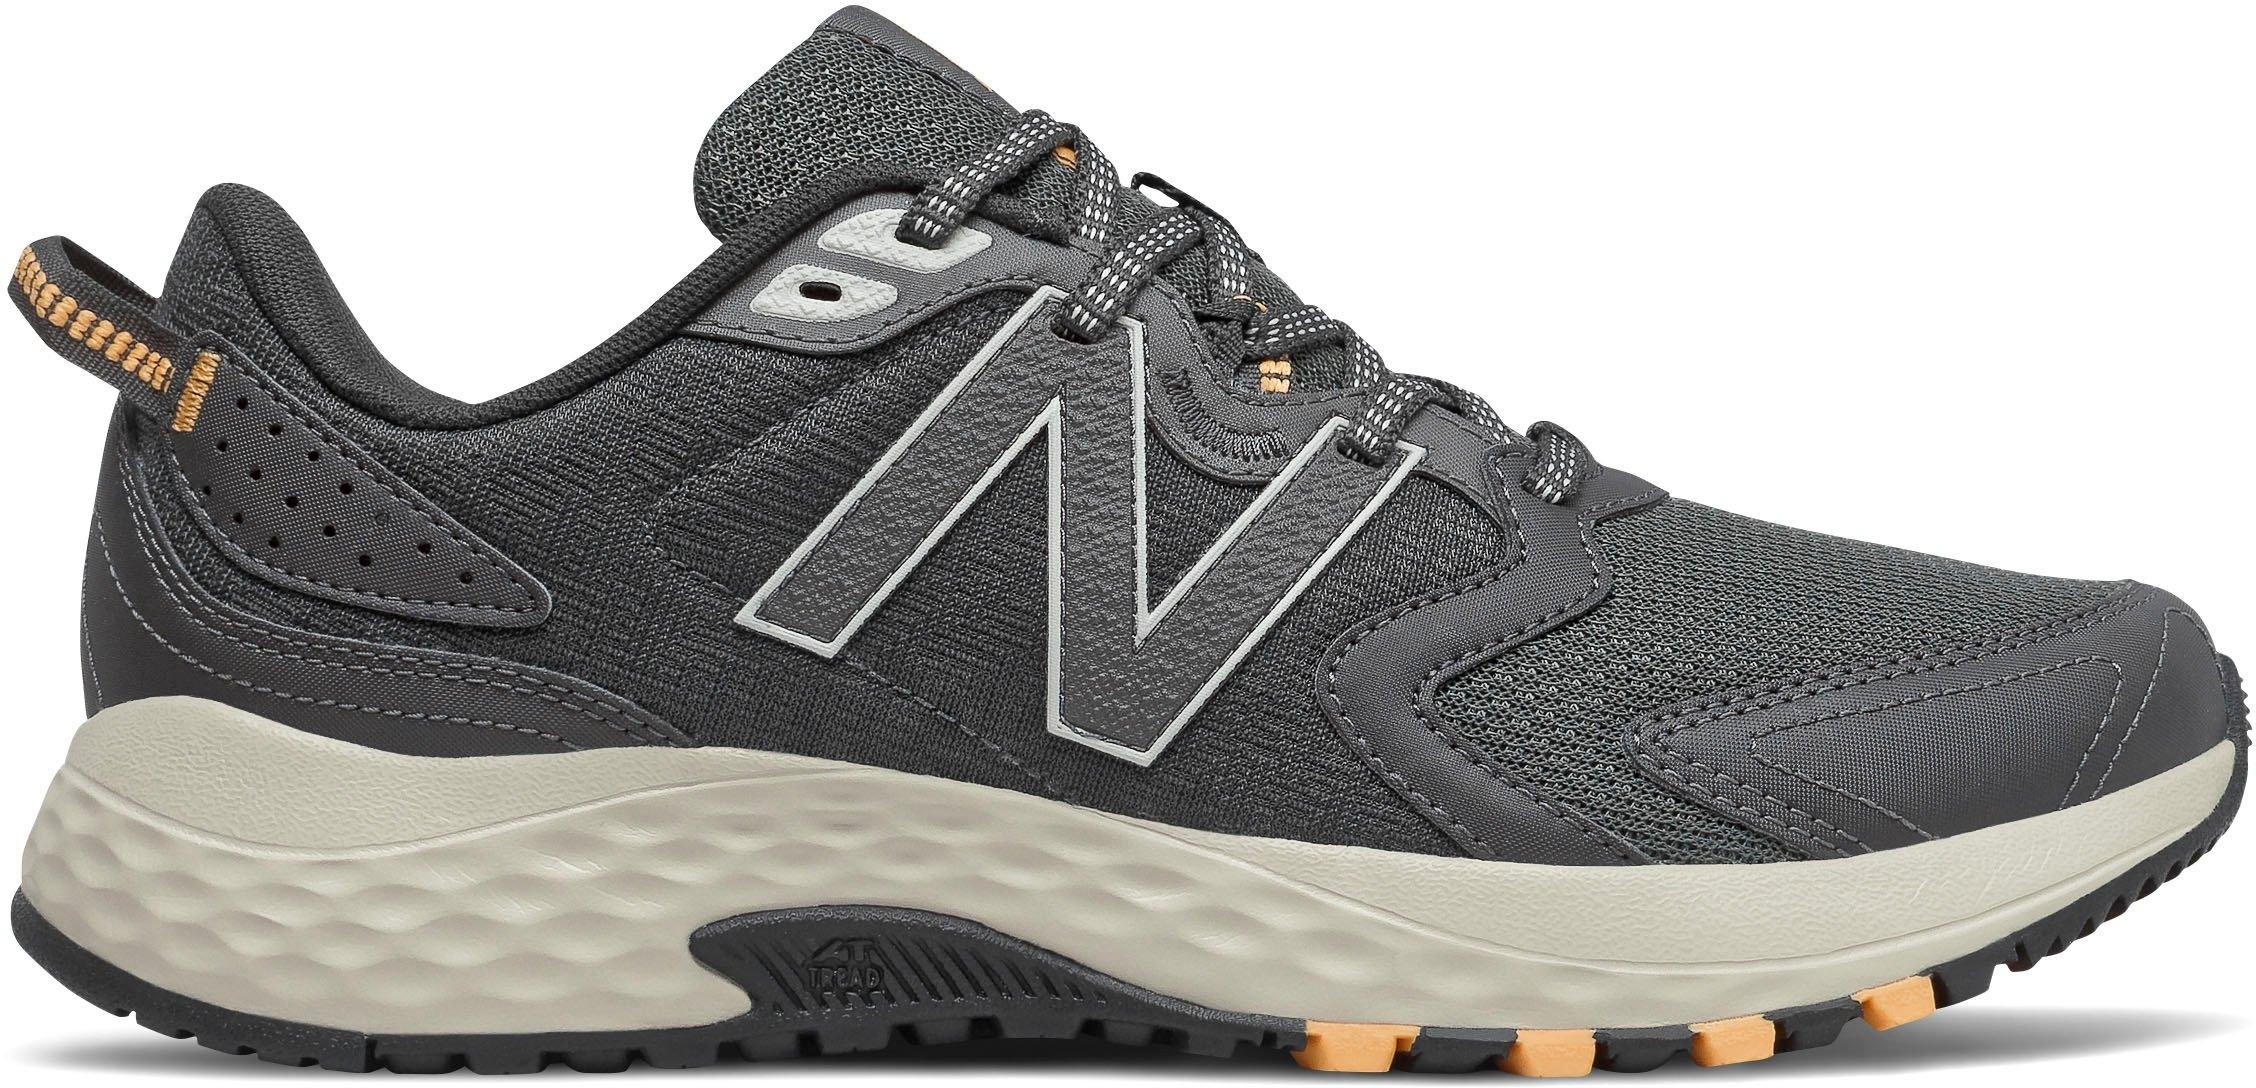 New Balance wandelschoenen »MT 410« nu online bestellen